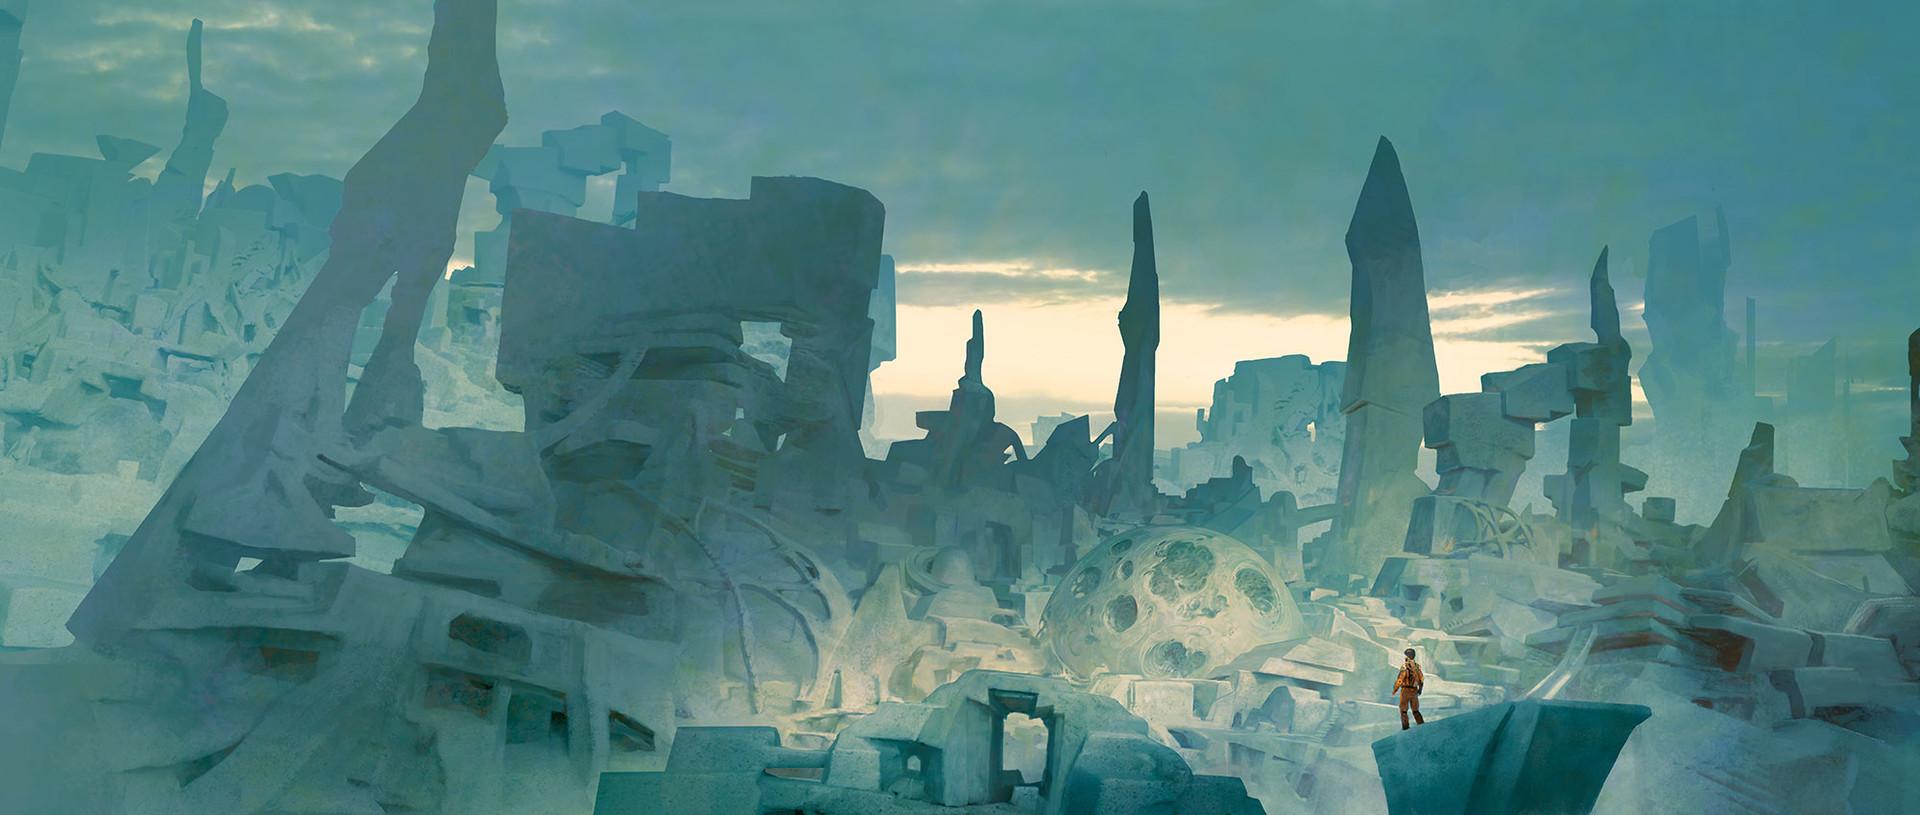 Marc simonetti stone city cm3